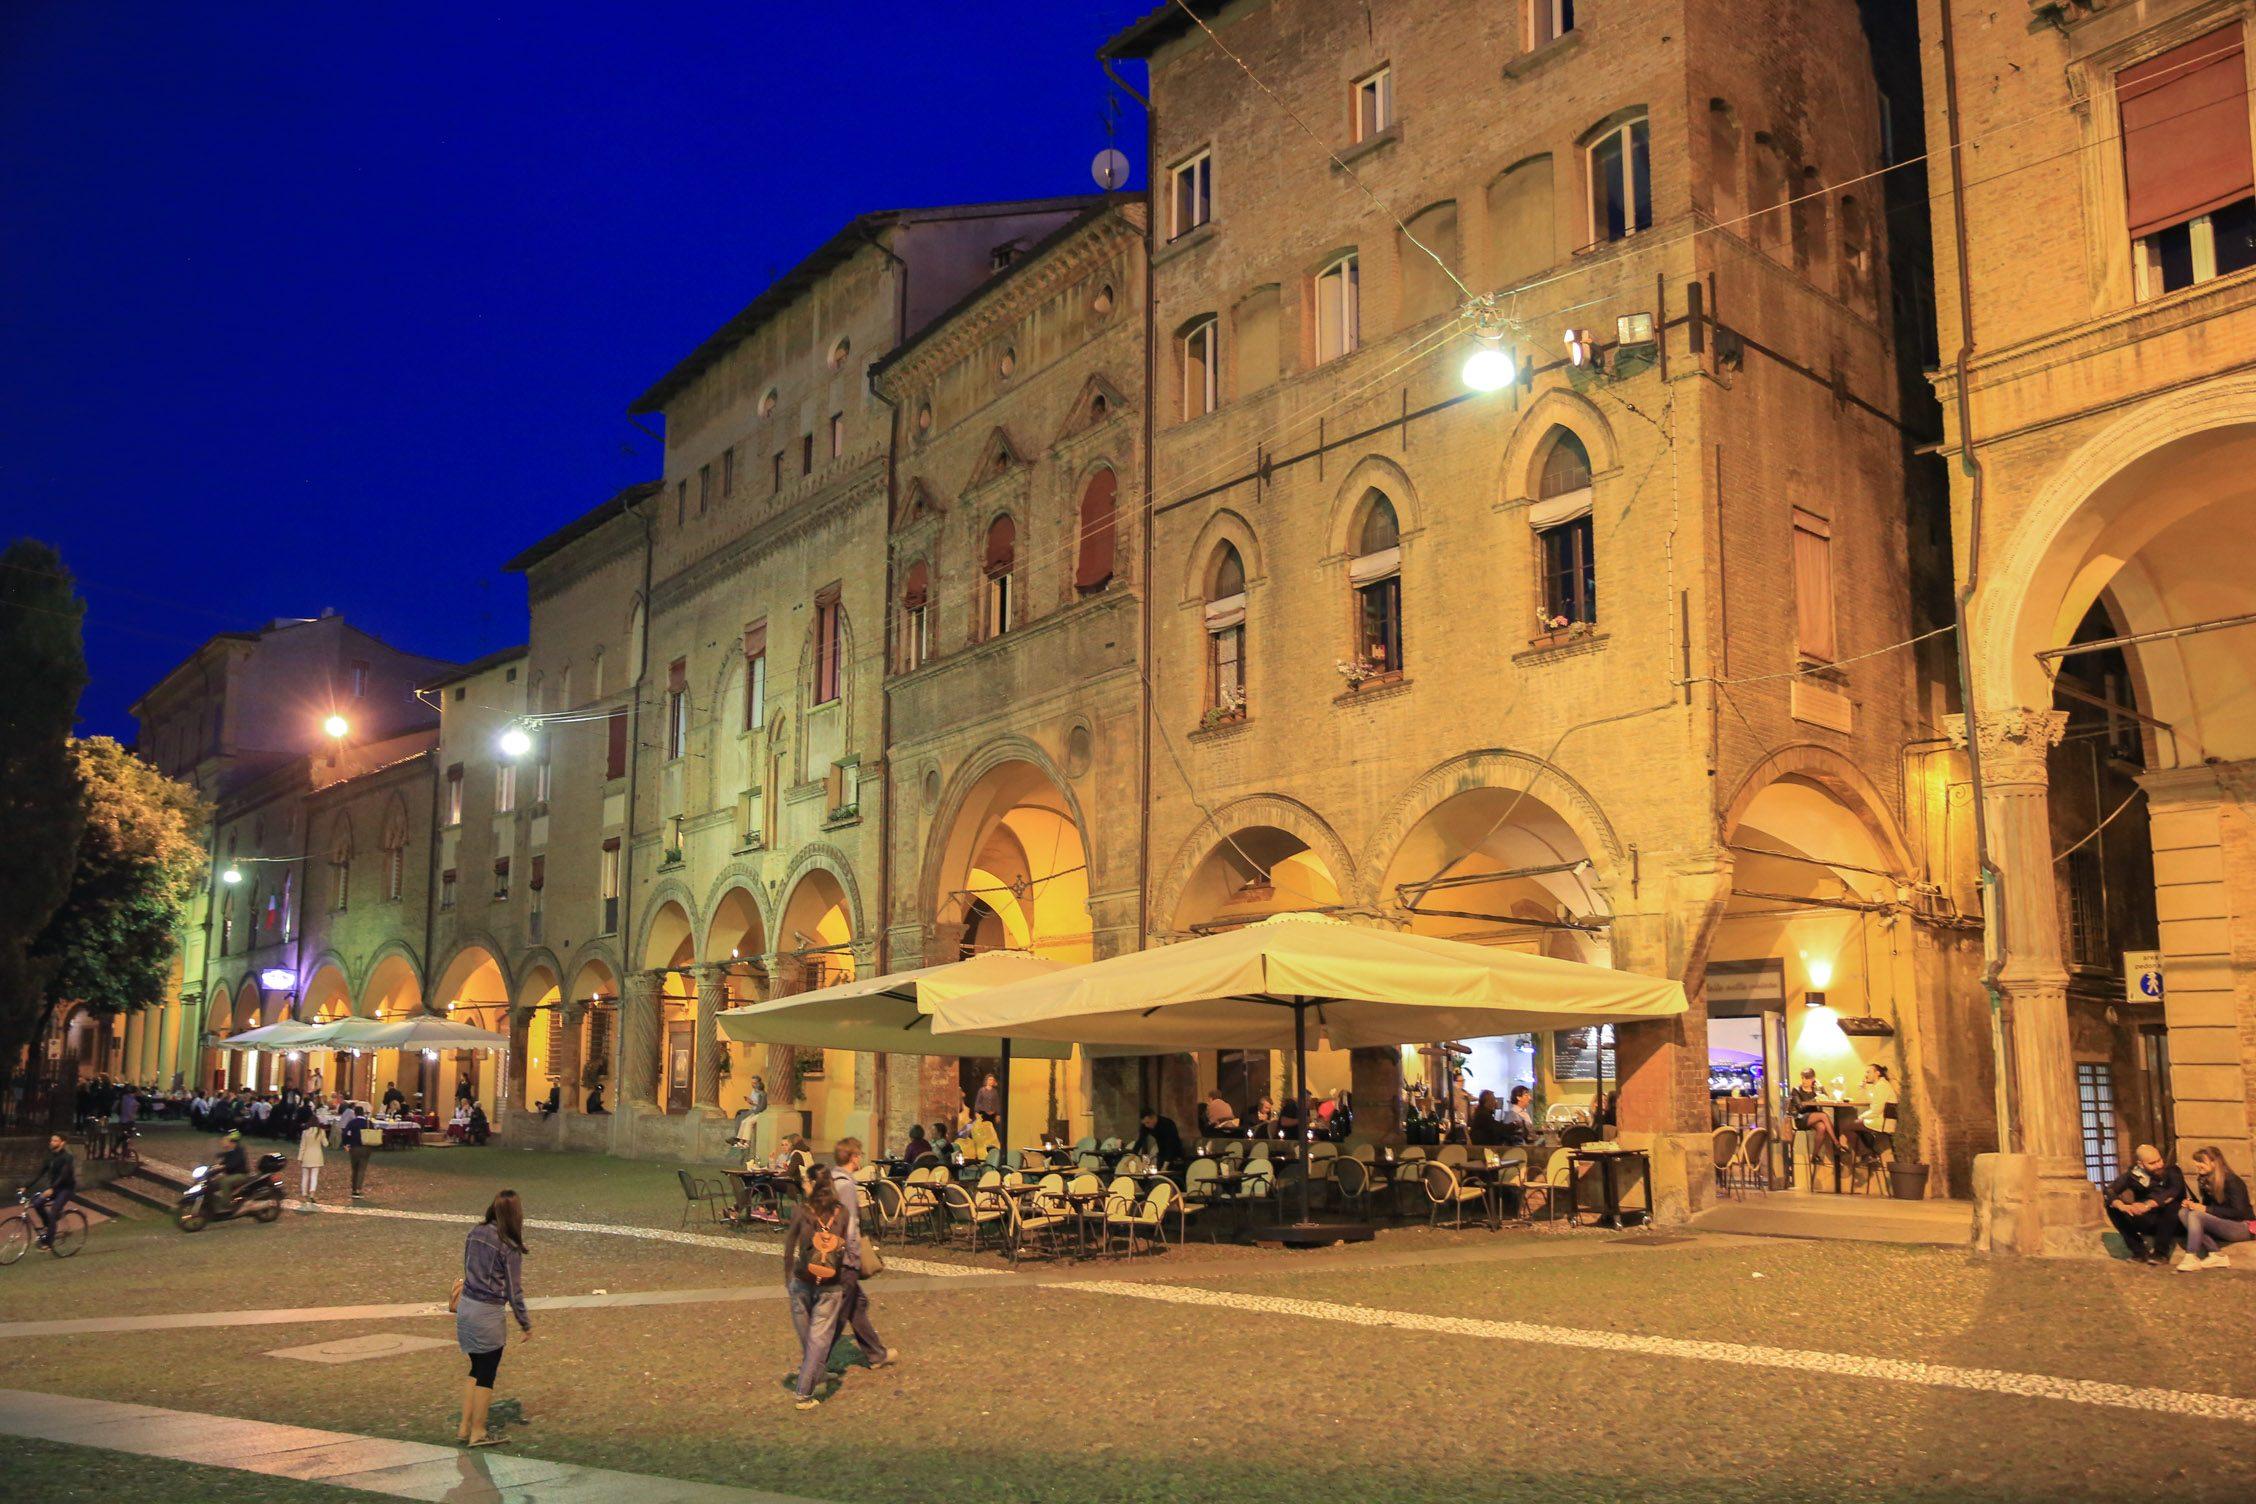 Piazzo San Stefano in de avond